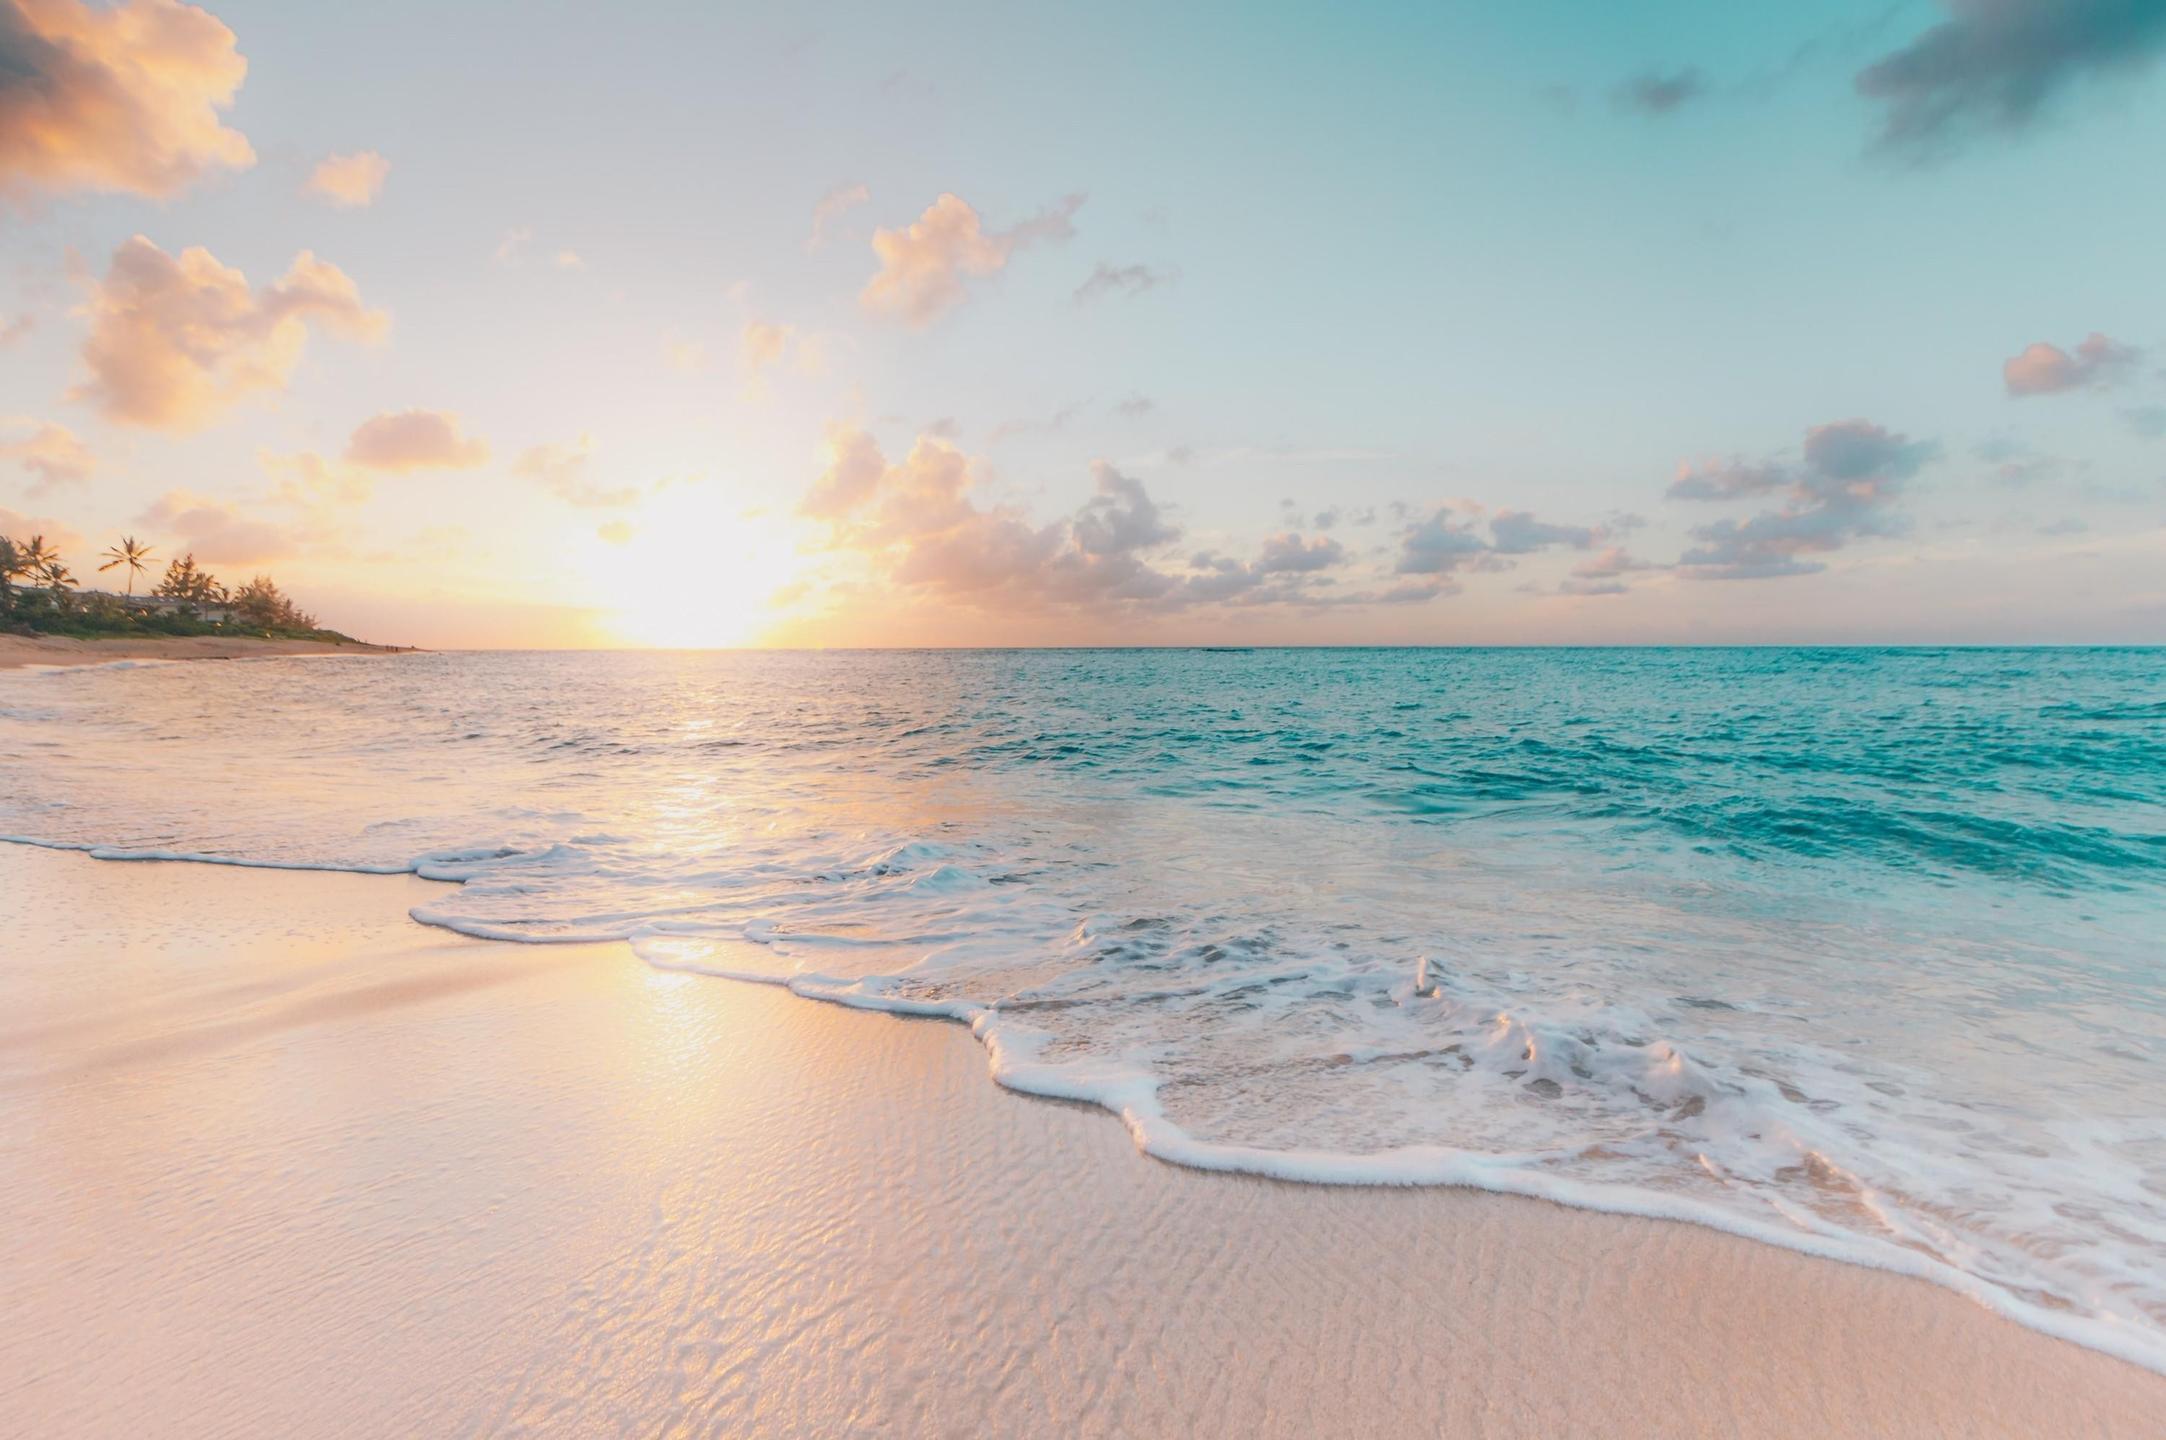 Sun shining over calm beach waves